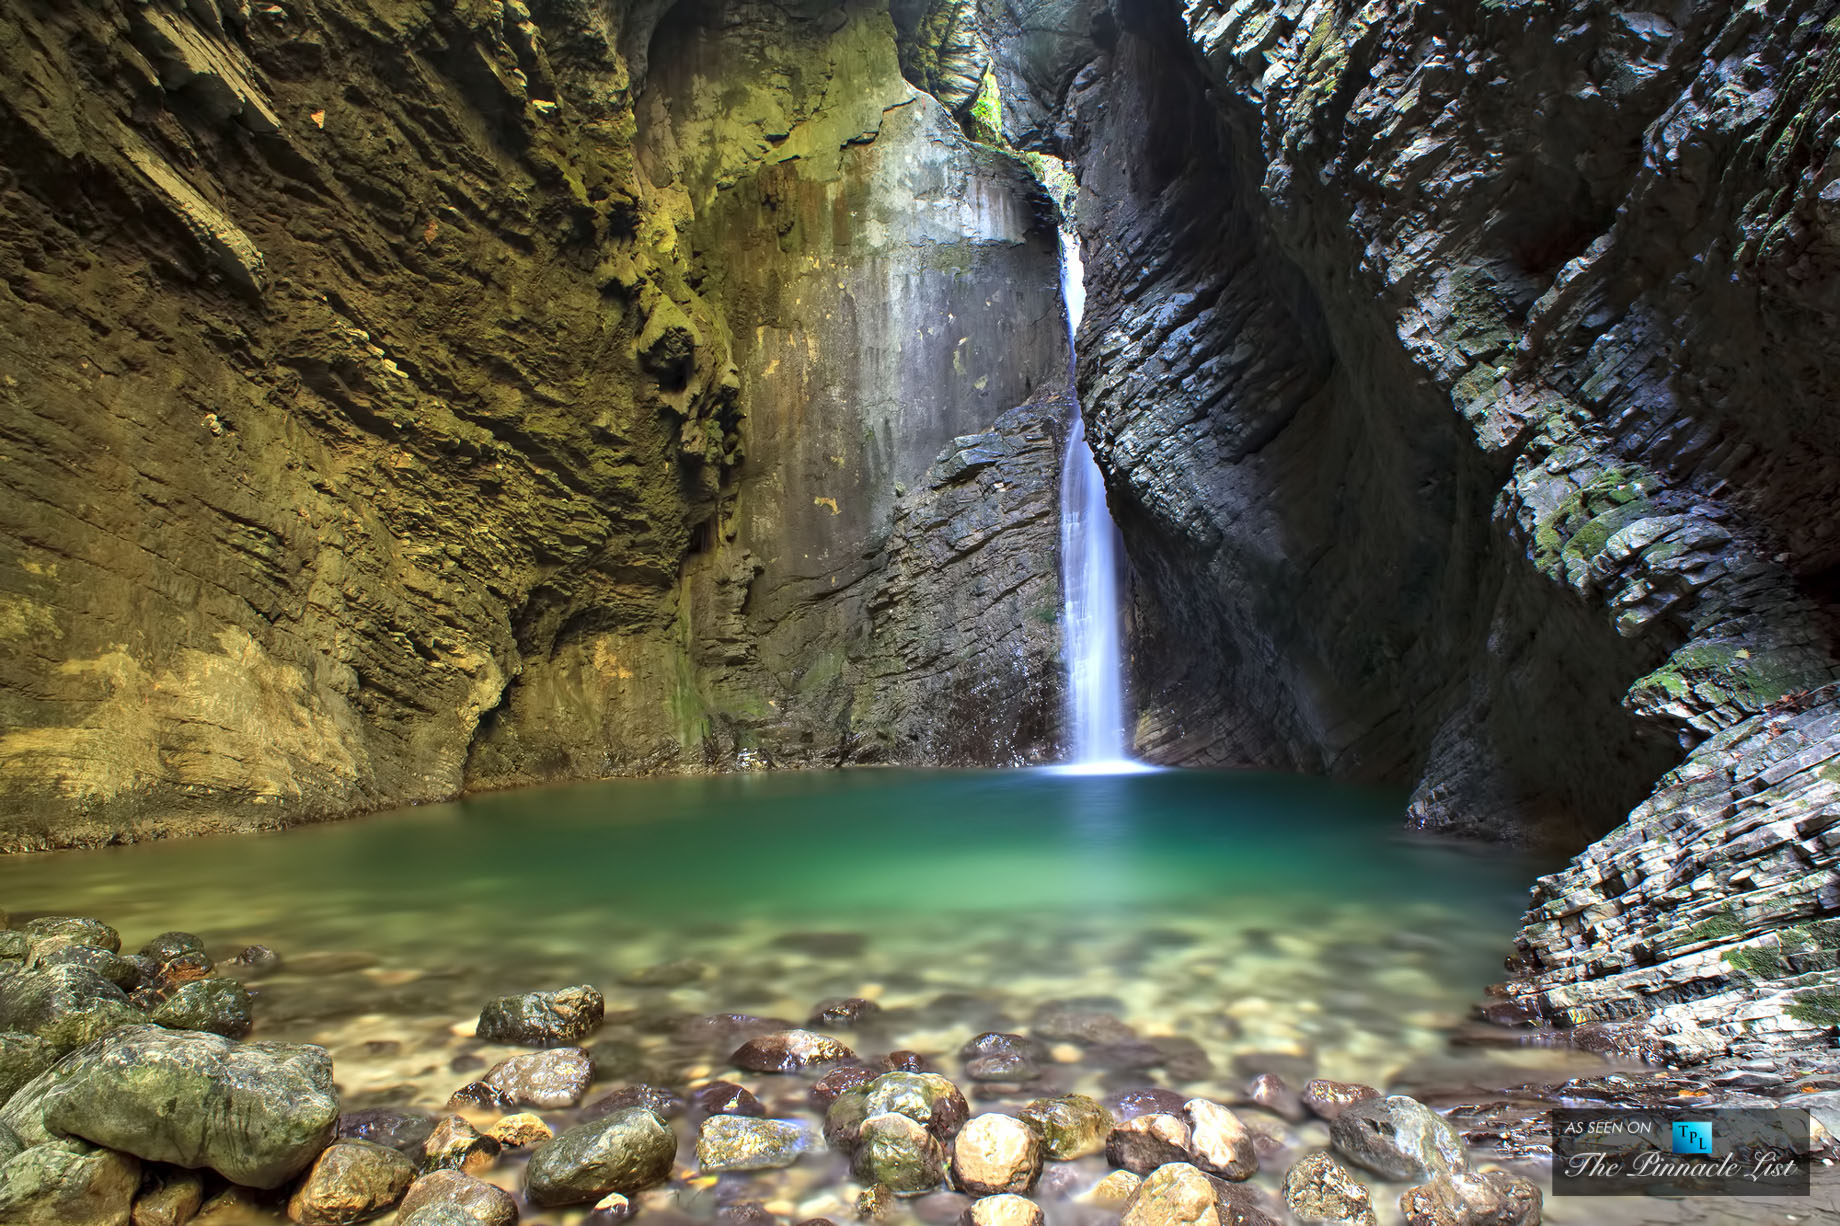 Kobarid, Slovenia - Top 5 Secret Luxury Locations in Eastern Europe